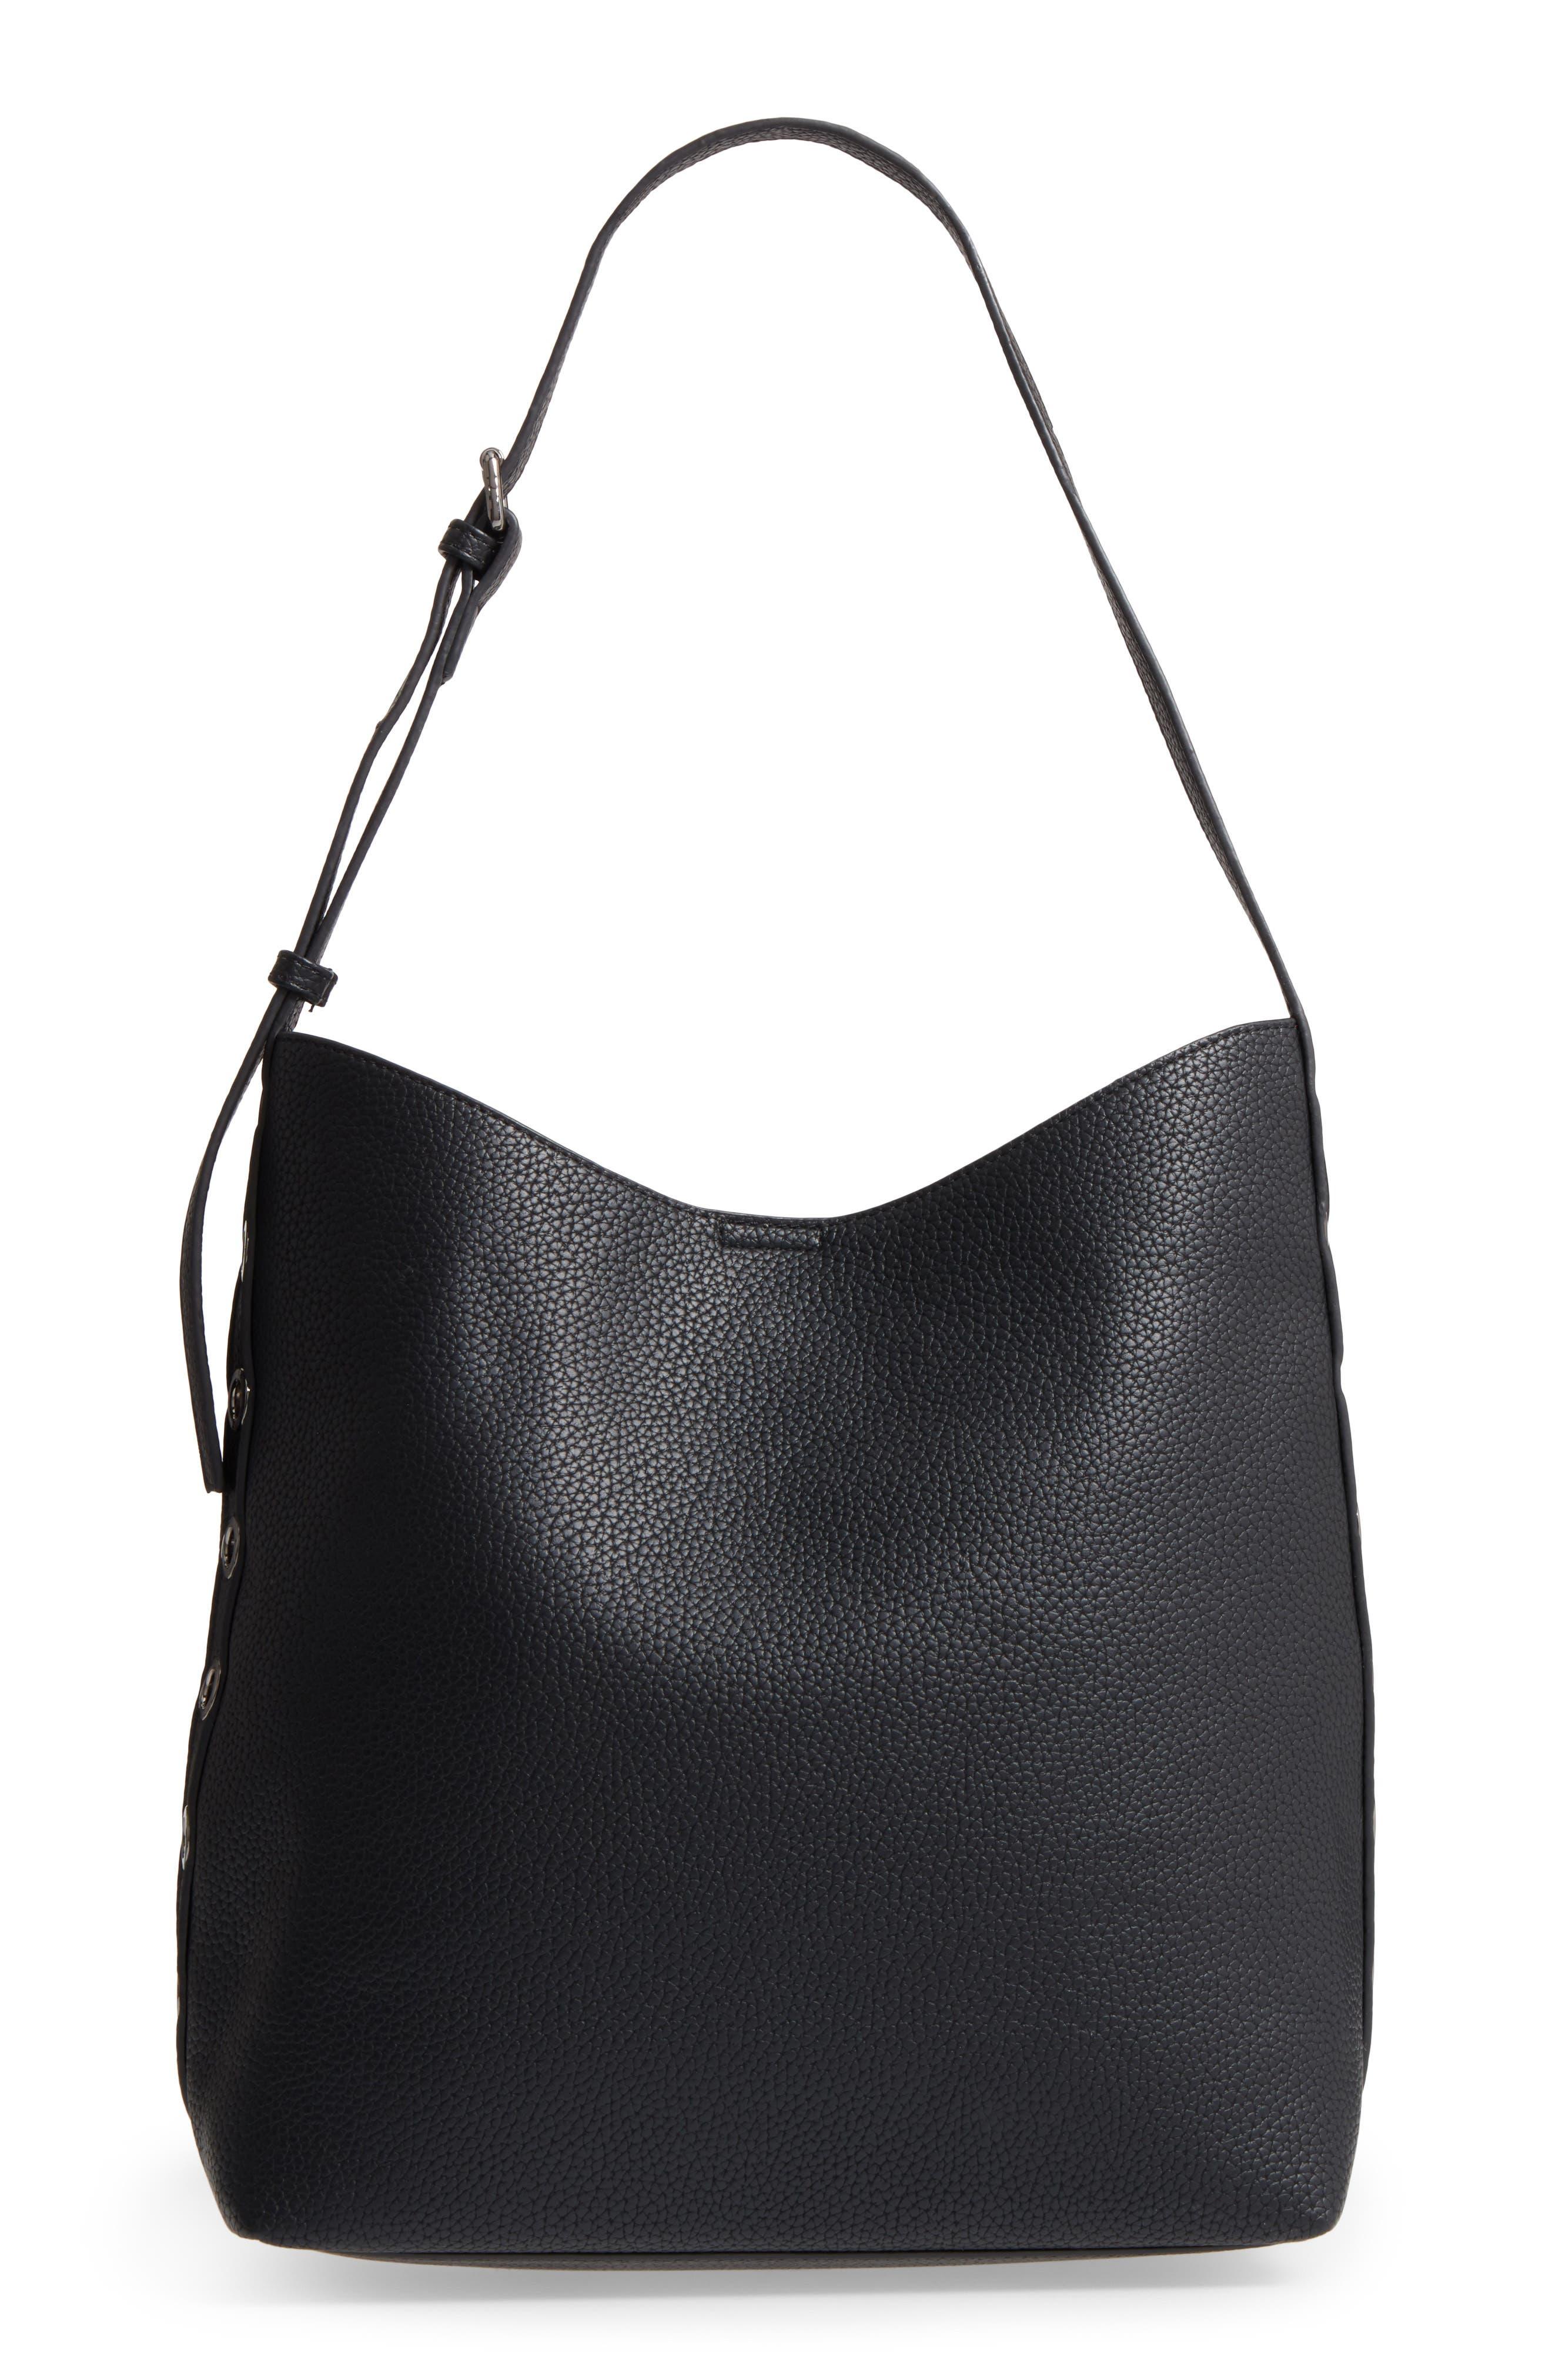 Sole Society Samara Faux Leather Shoulder Bag